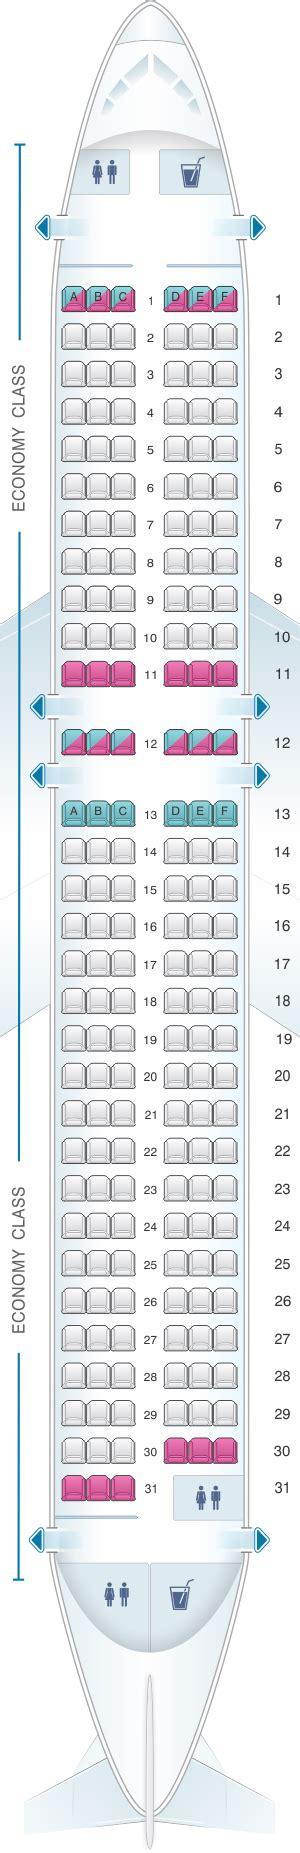 plan siege avion easyjet plan de cabine easyjet airbus a320 seatmaestro fr